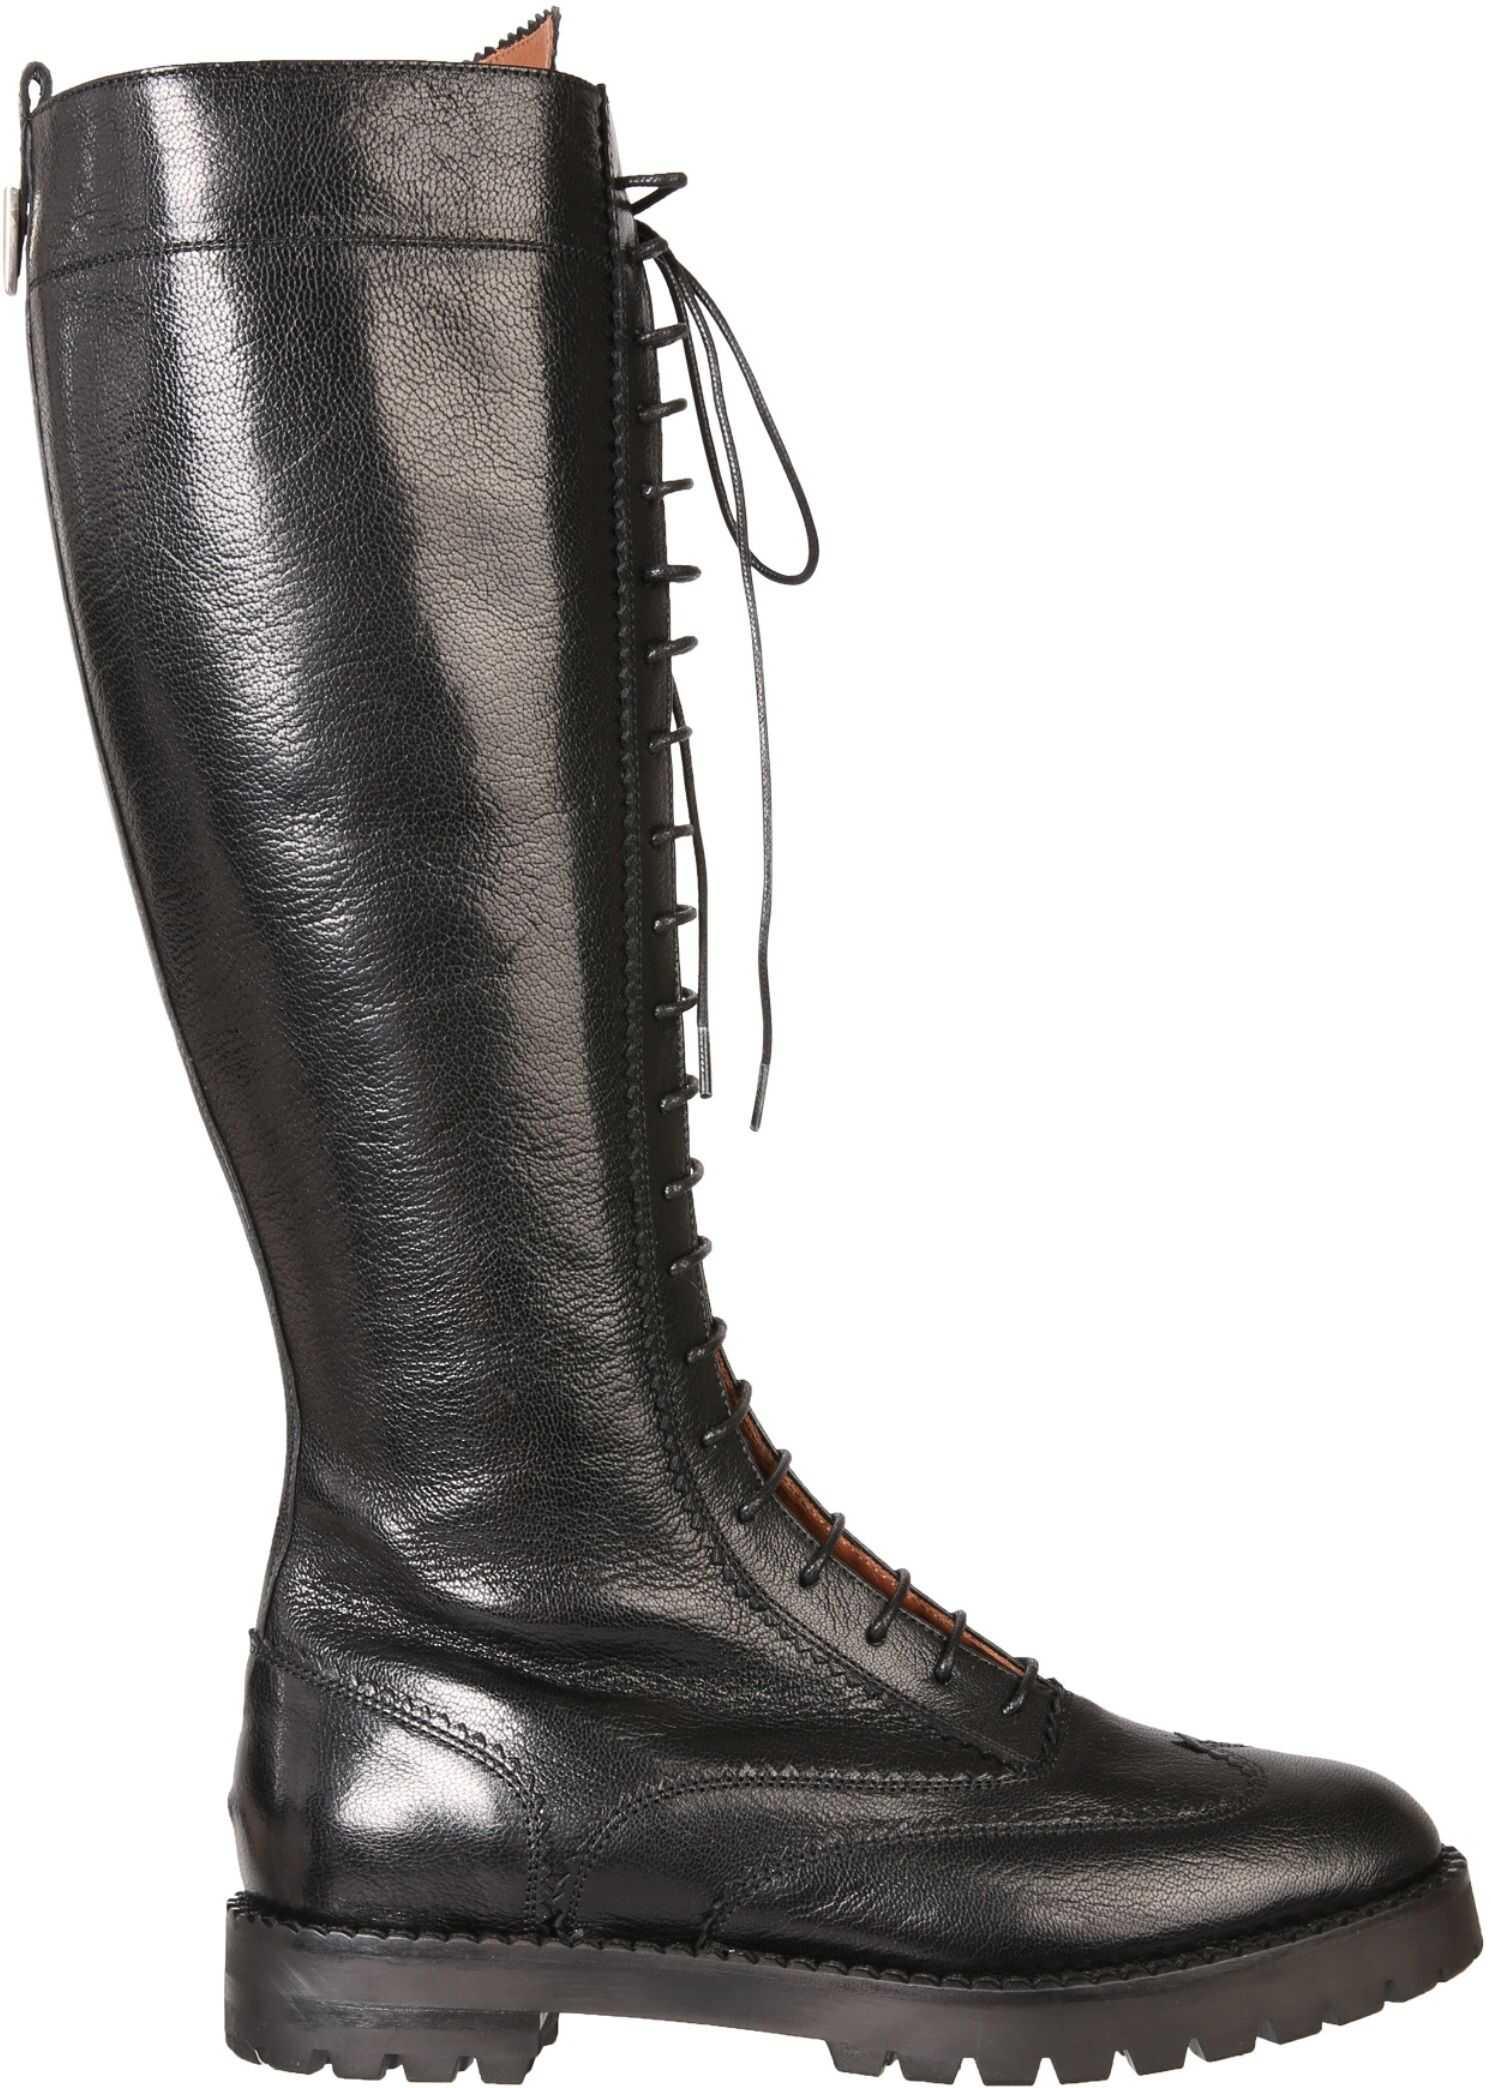 L'Autre Chose High Boots With Laces LDM020_24661001 BLACK imagine b-mall.ro